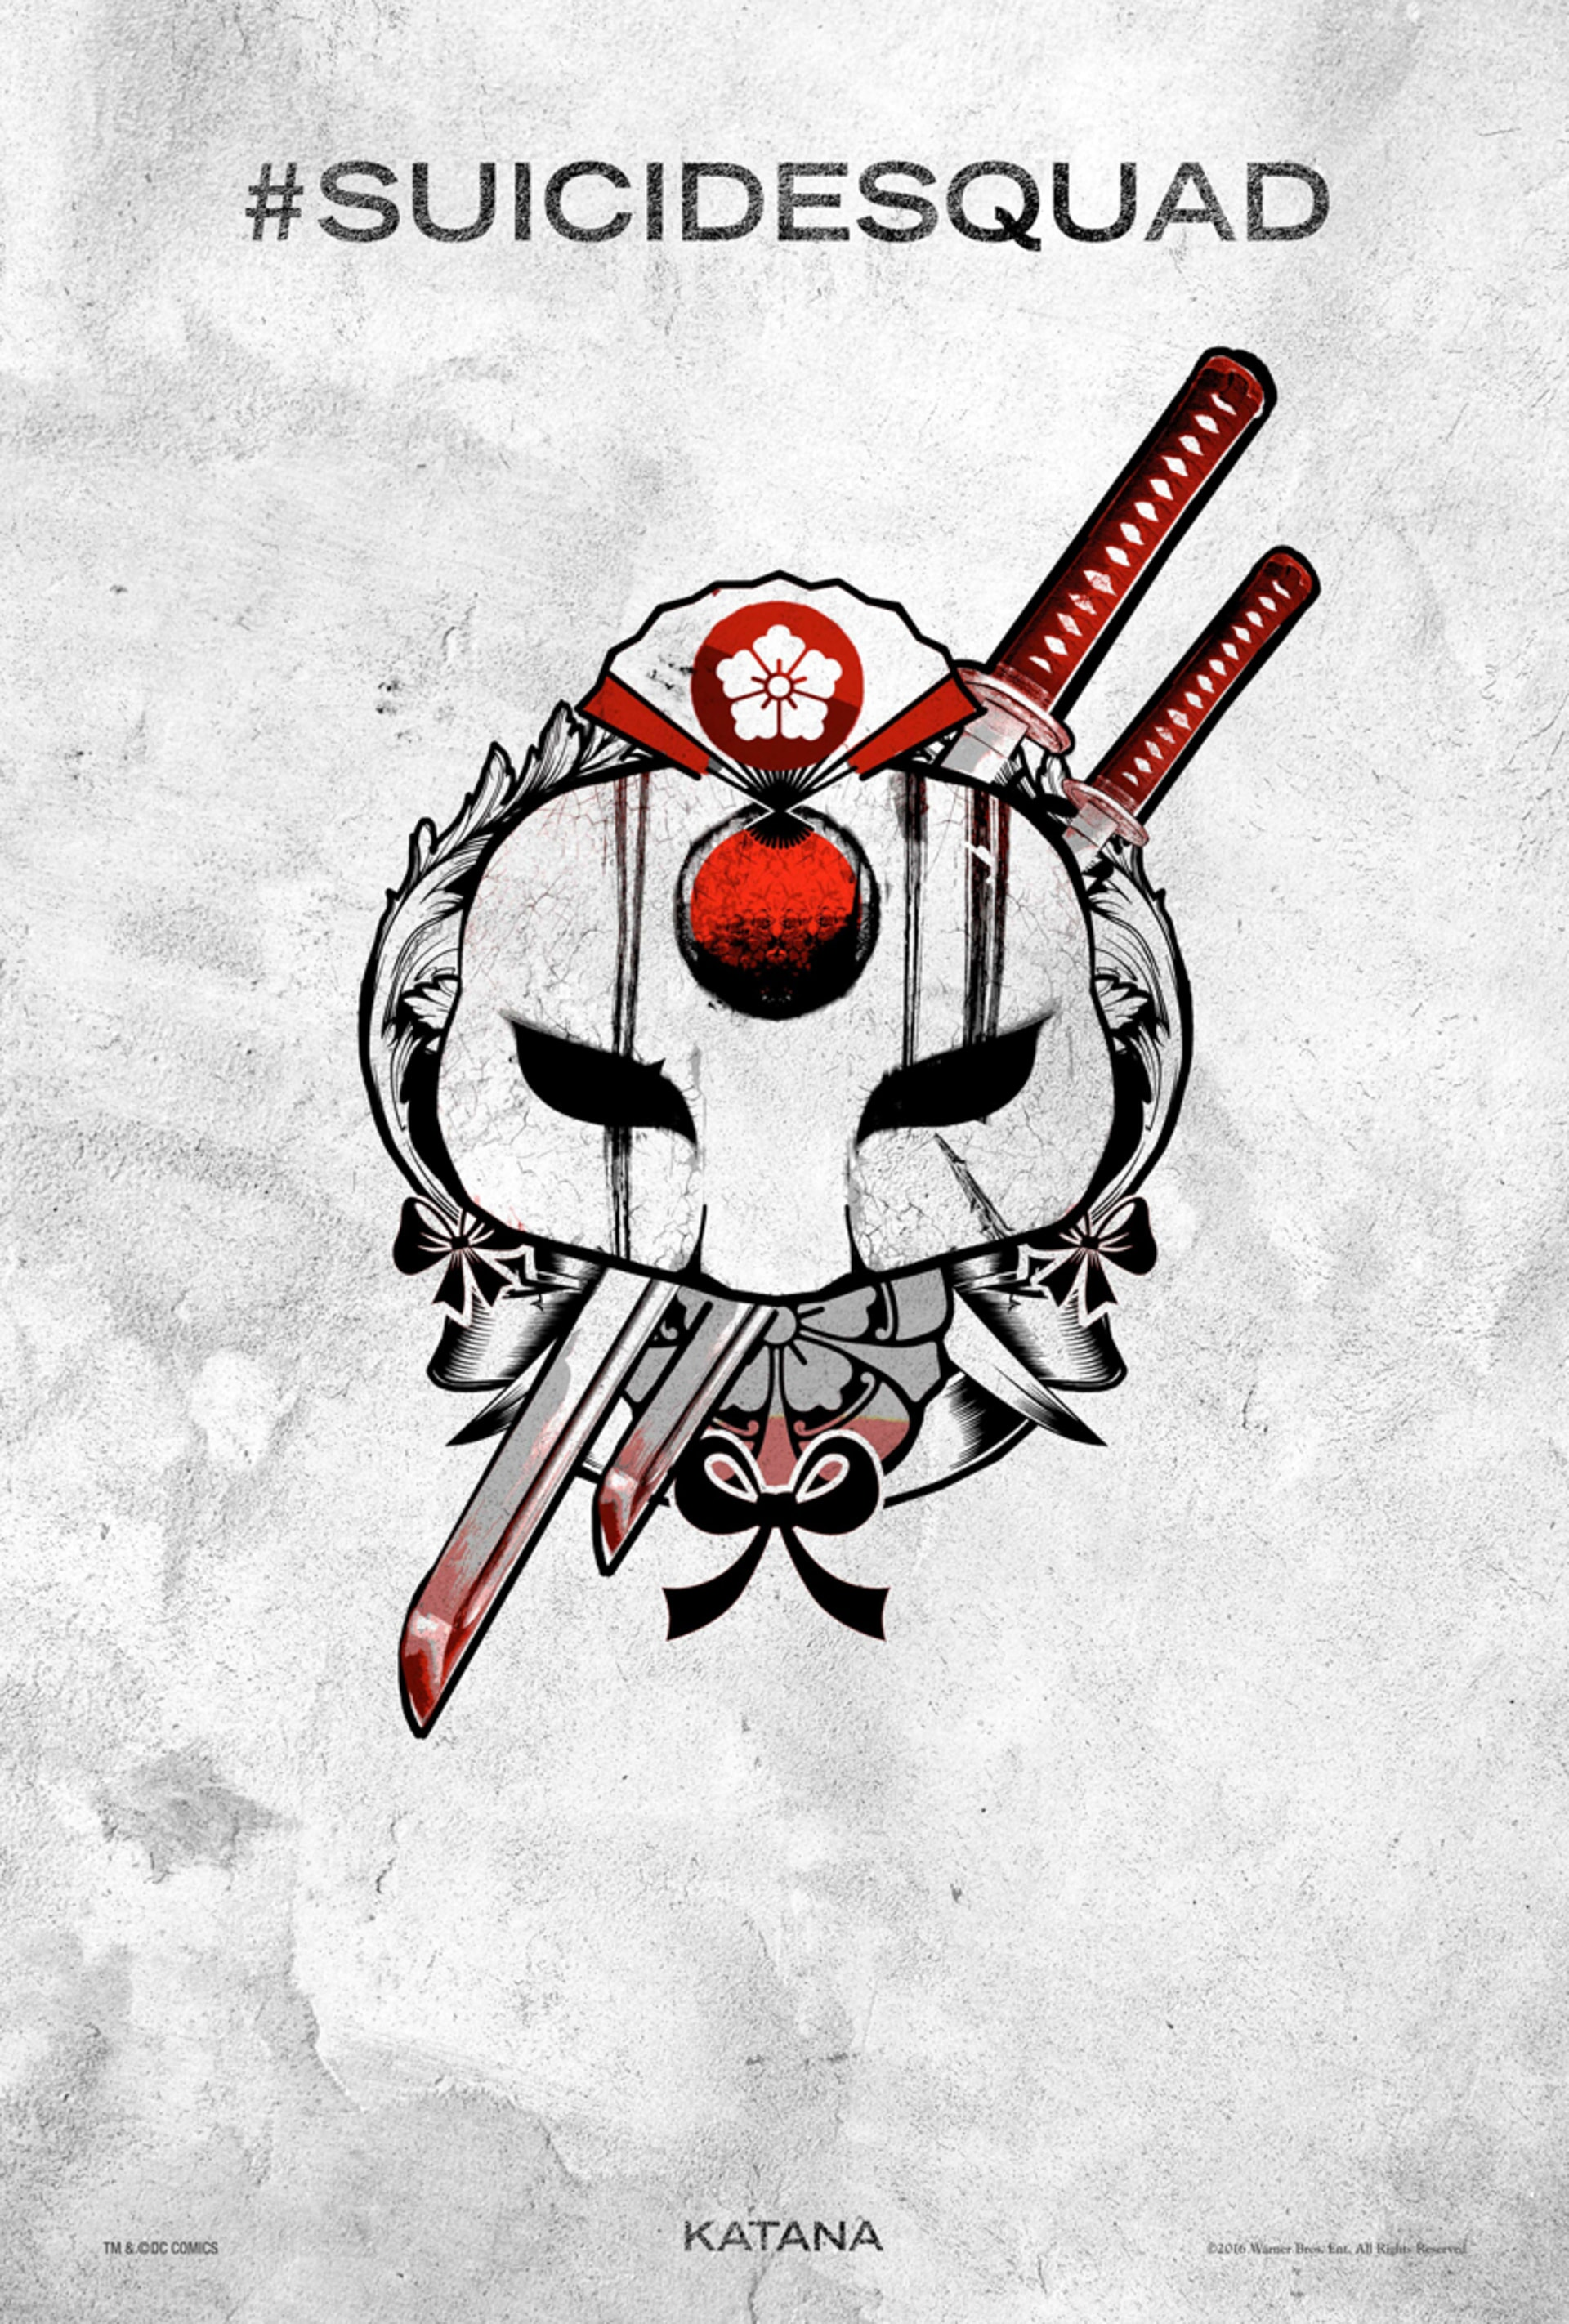 Suicide Squad tattoo poster: Katana